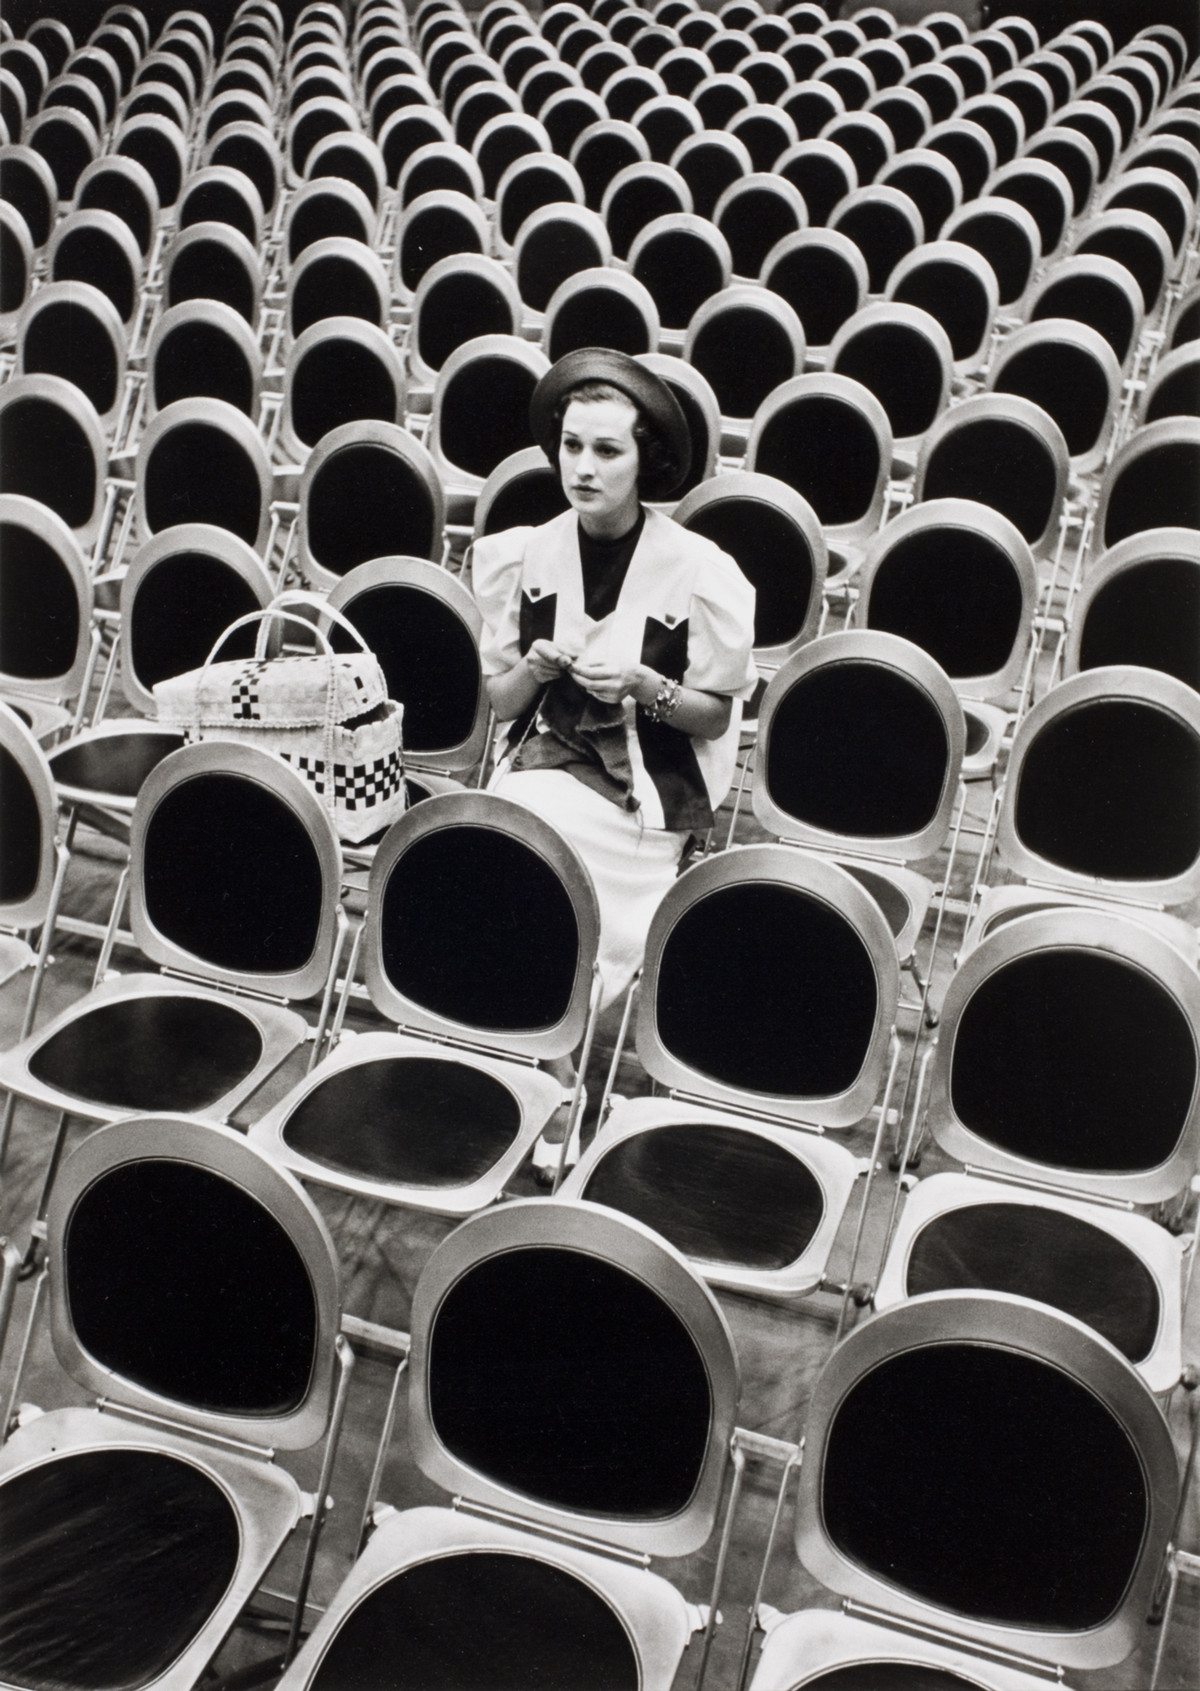 Alfred Eisenstaedt photos of  Singer Jane Foreman at NBC 4H Studios in New York, 1937.